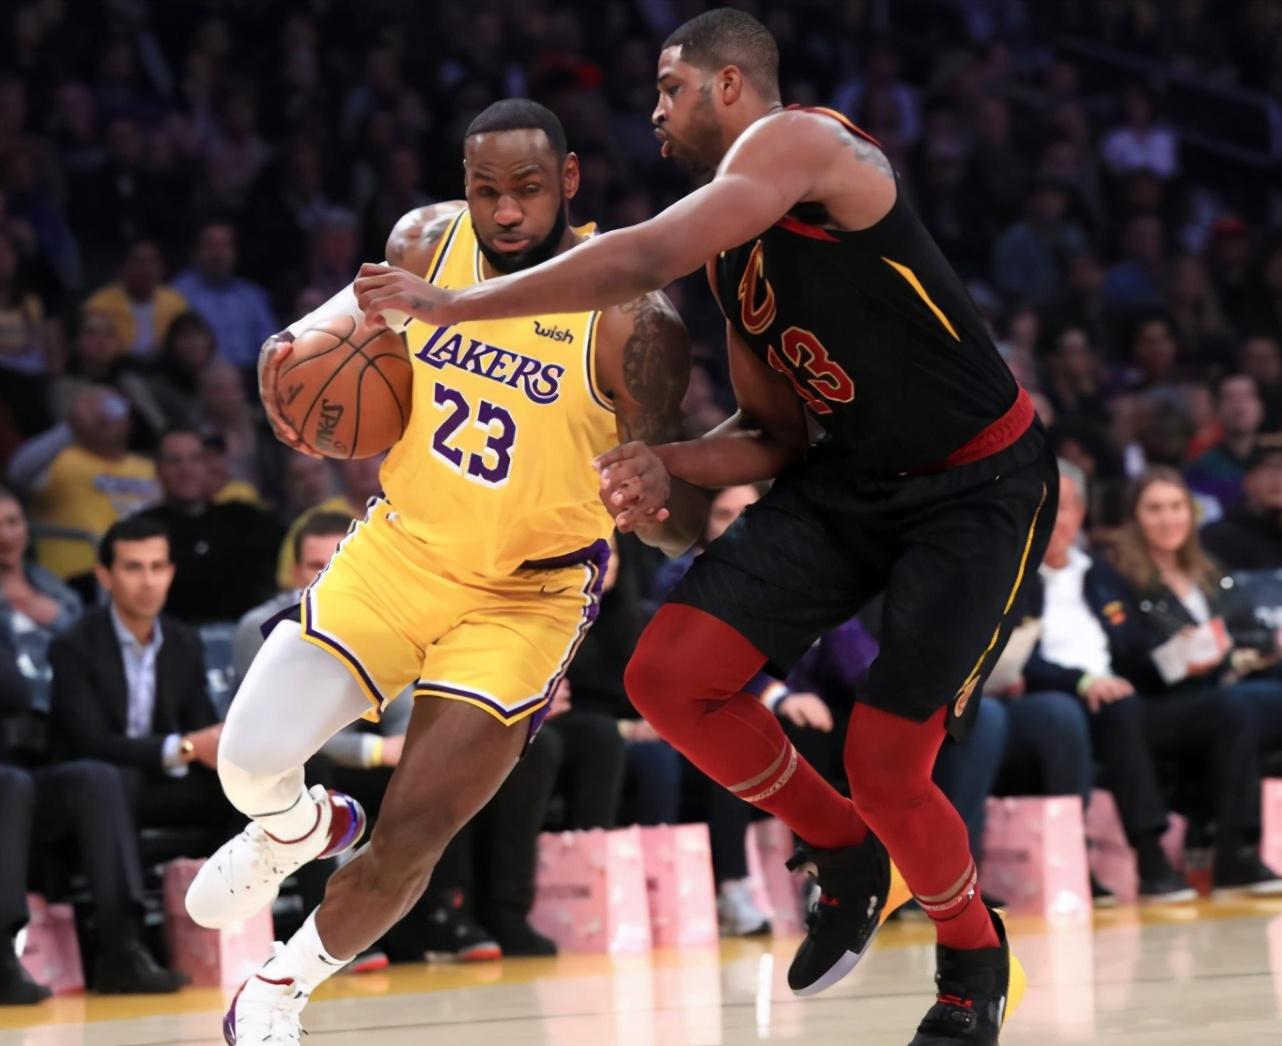 NBA打法最傷身體的5大球星,詹皇如推土機,歐肥太殘暴,羅斯似非人類!-黑特籃球-NBA新聞影音圖片分享社區